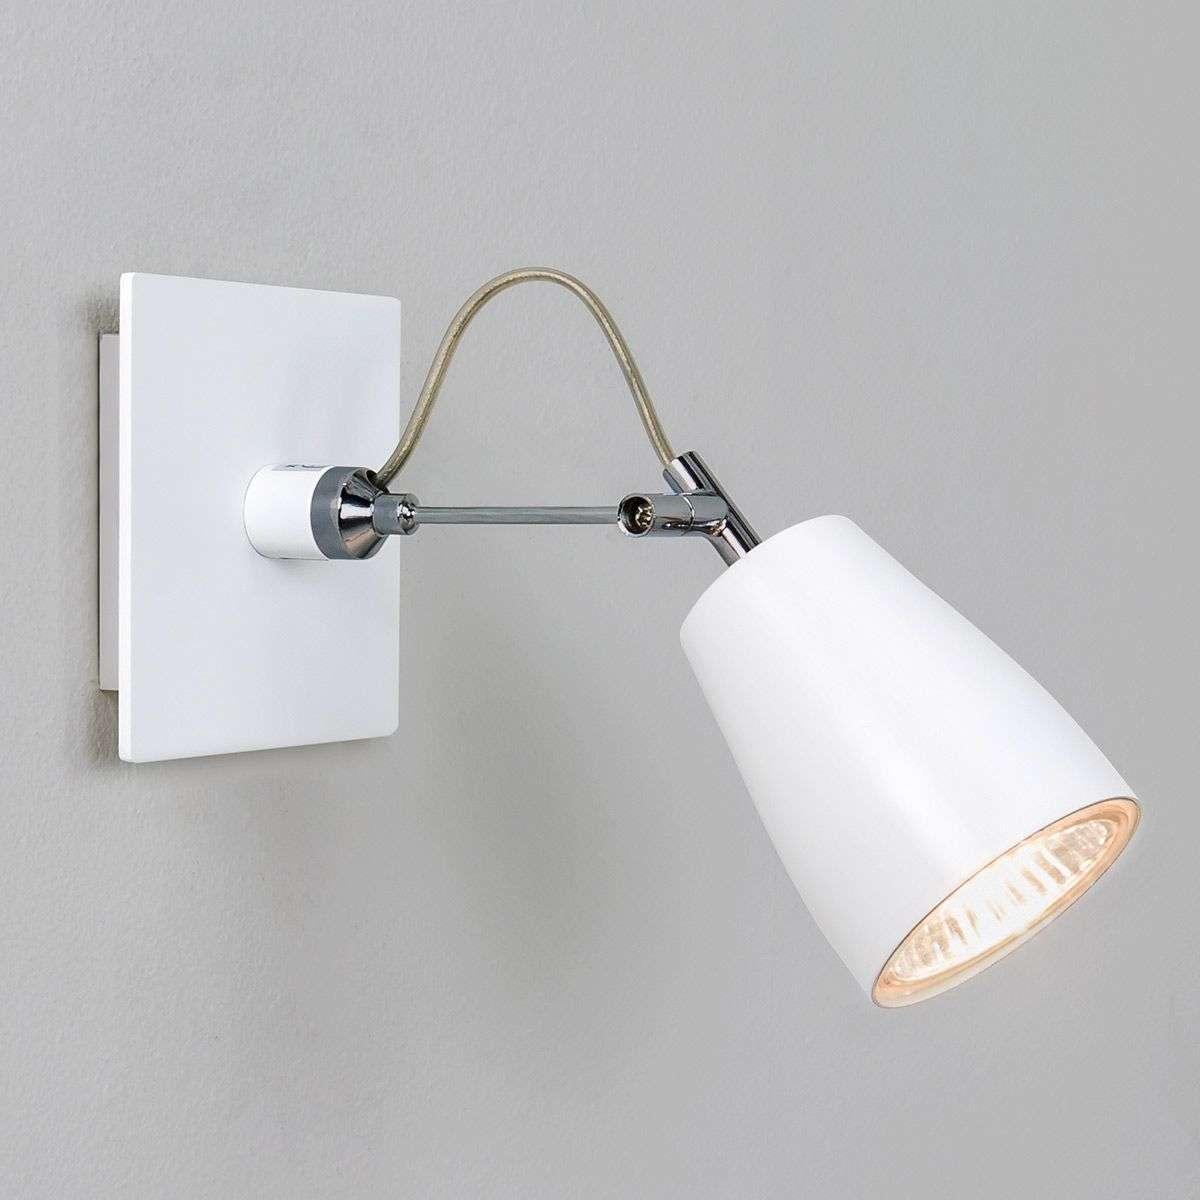 Polar Ceiling Spotlight Decorative-1020262-32